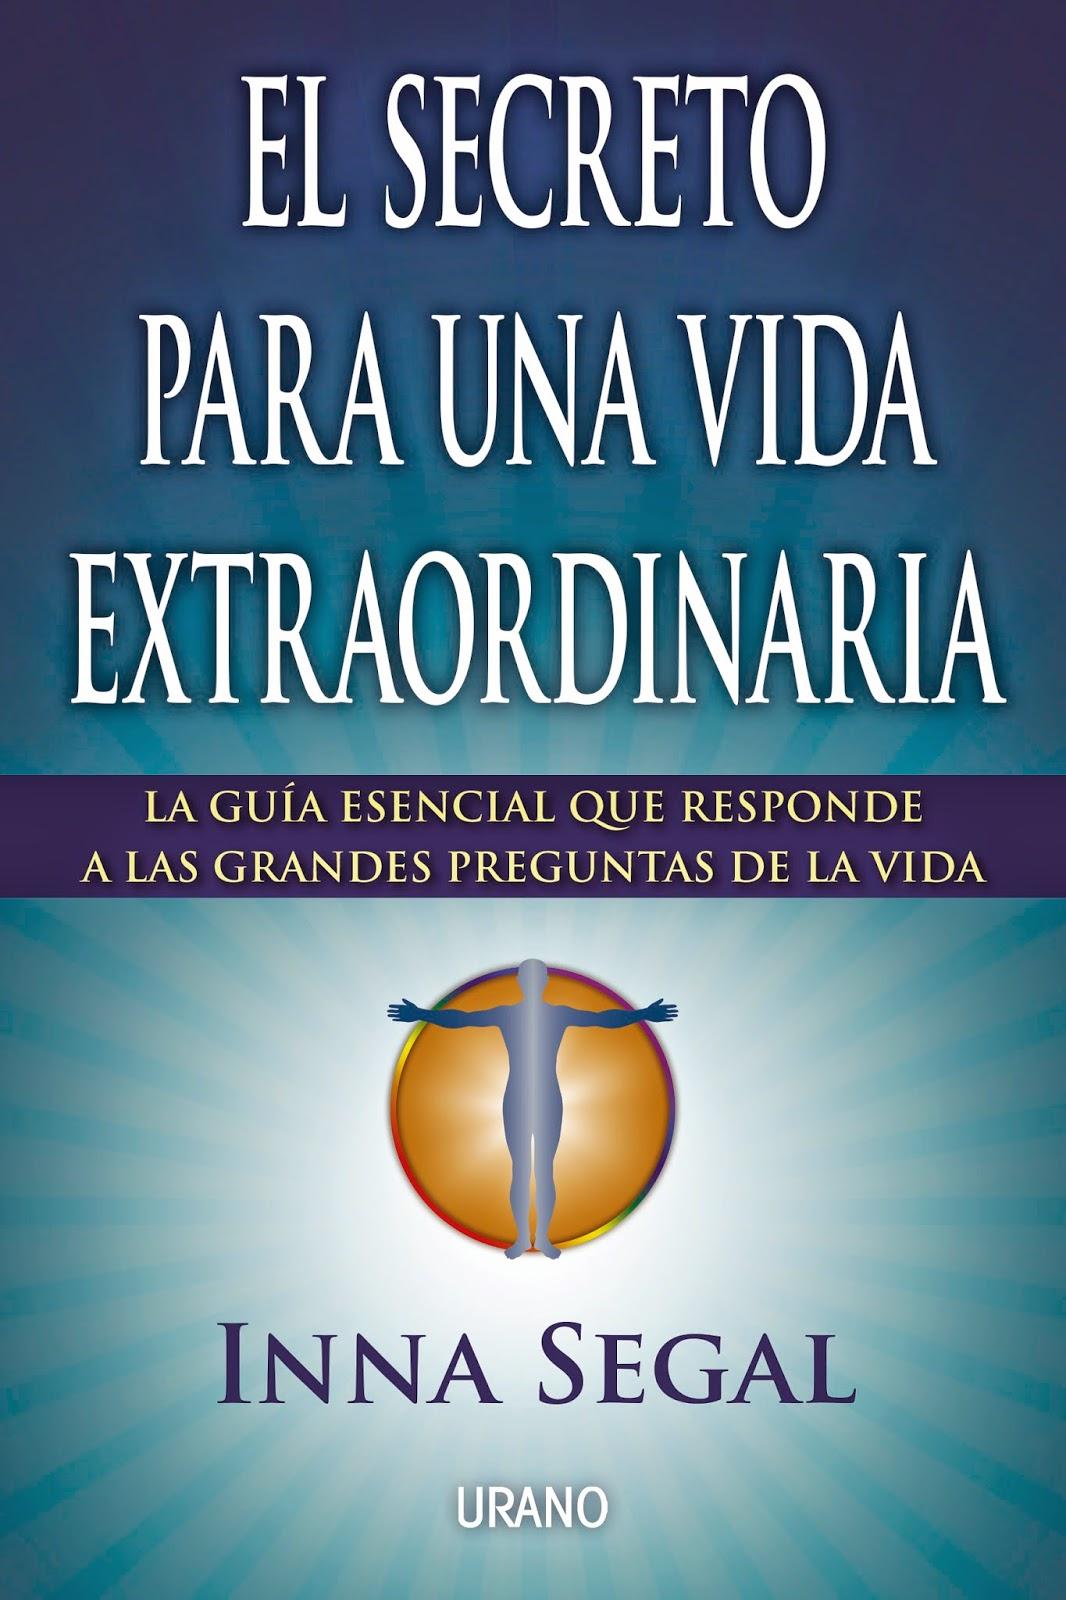 El secreto para una vida extraordinaria - Inna Segal